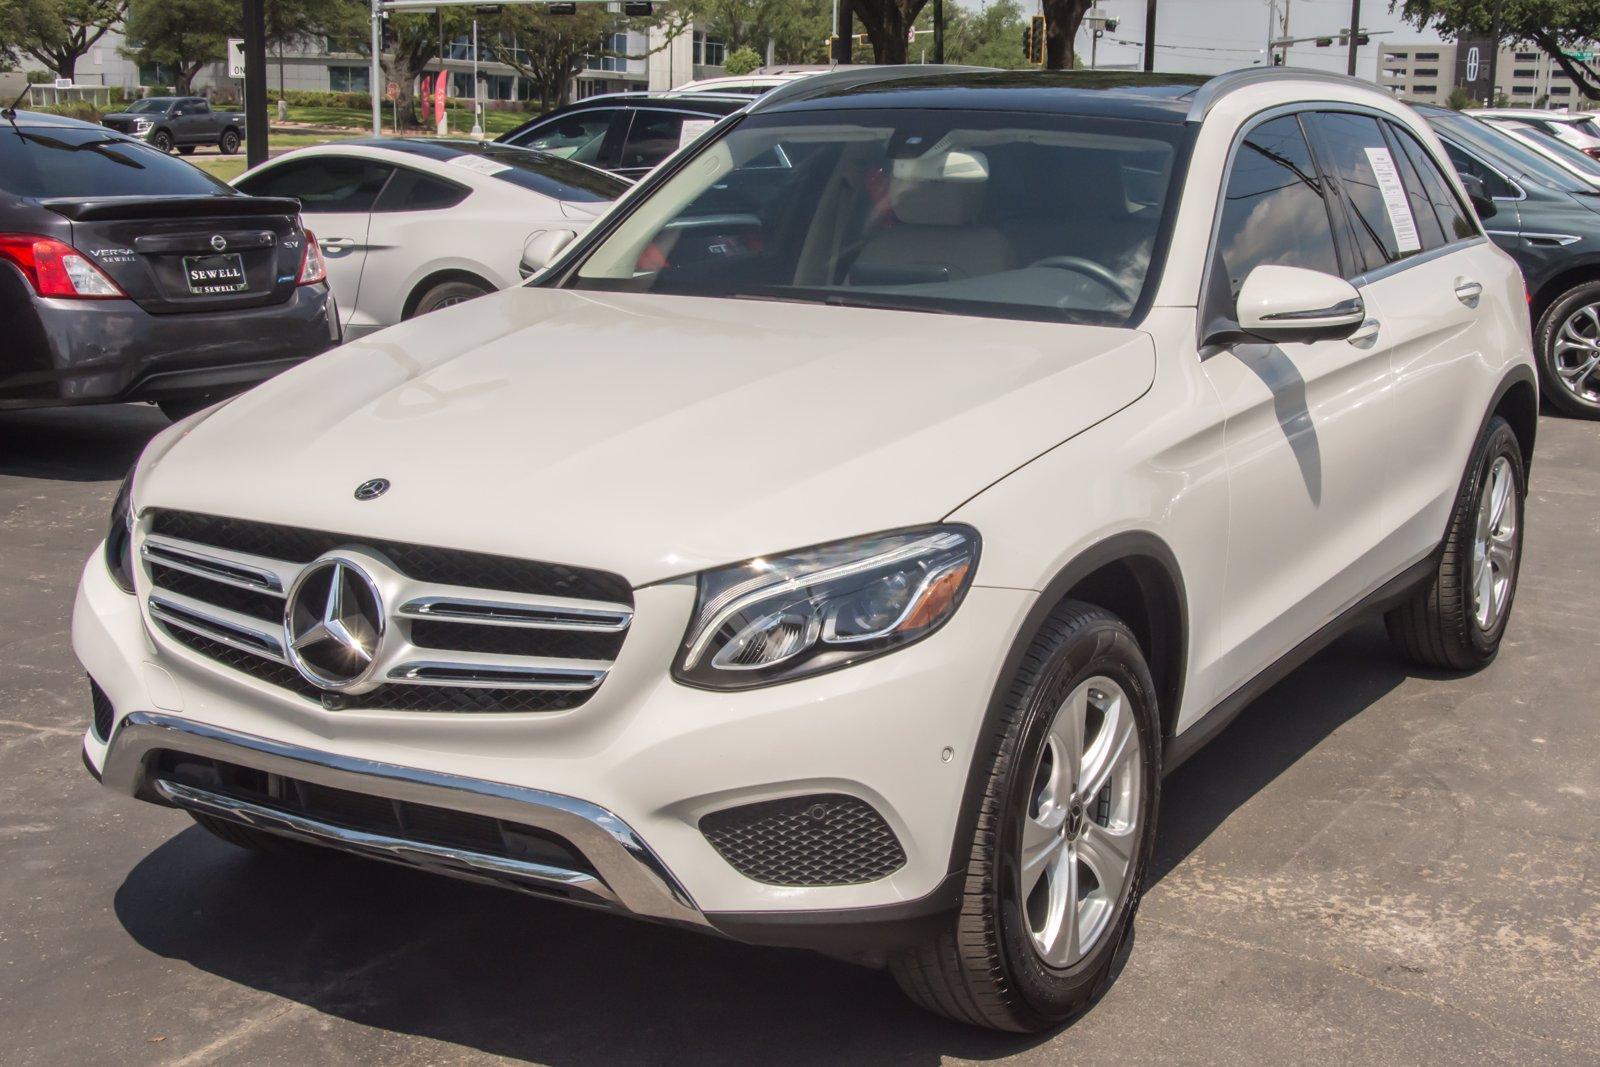 2018 Mercedes-Benz GLC Vehicle Photo in Dallas, TX 75209